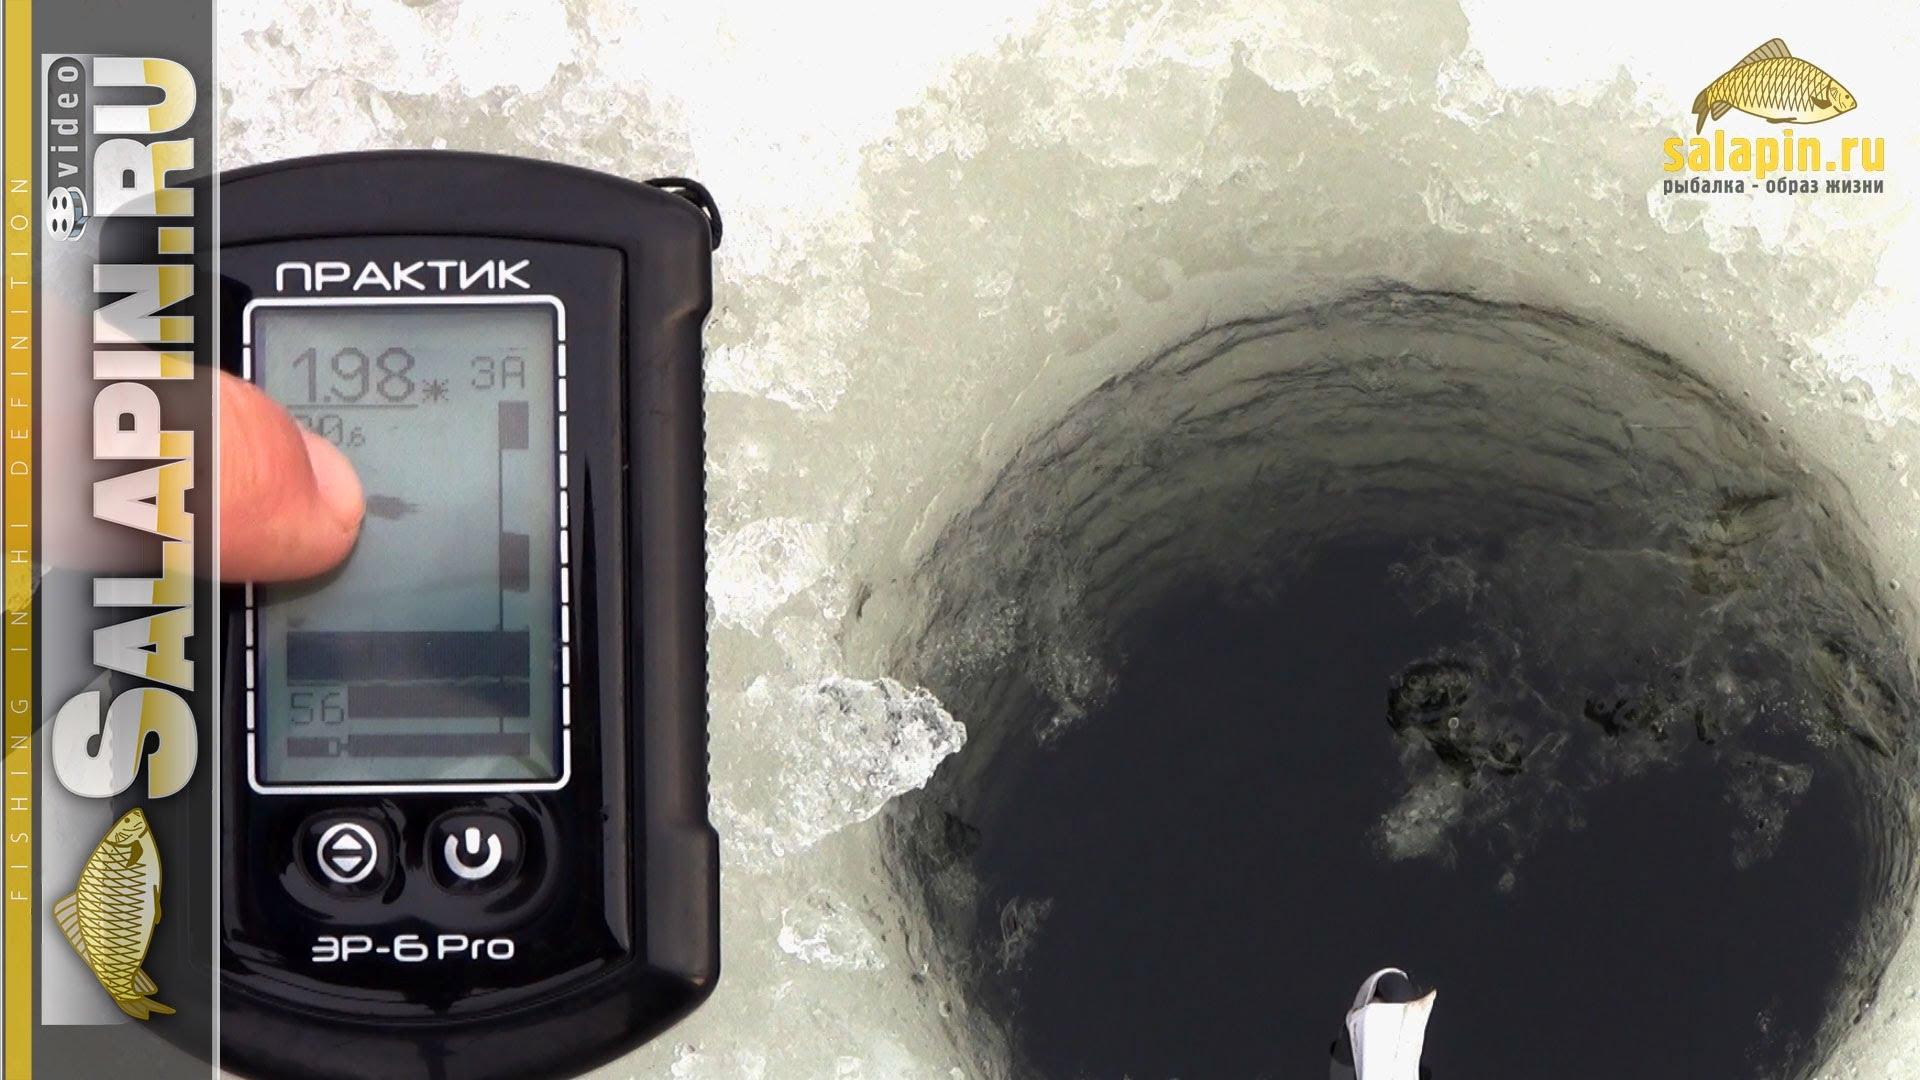 эхолот практик и видео по ловле судака